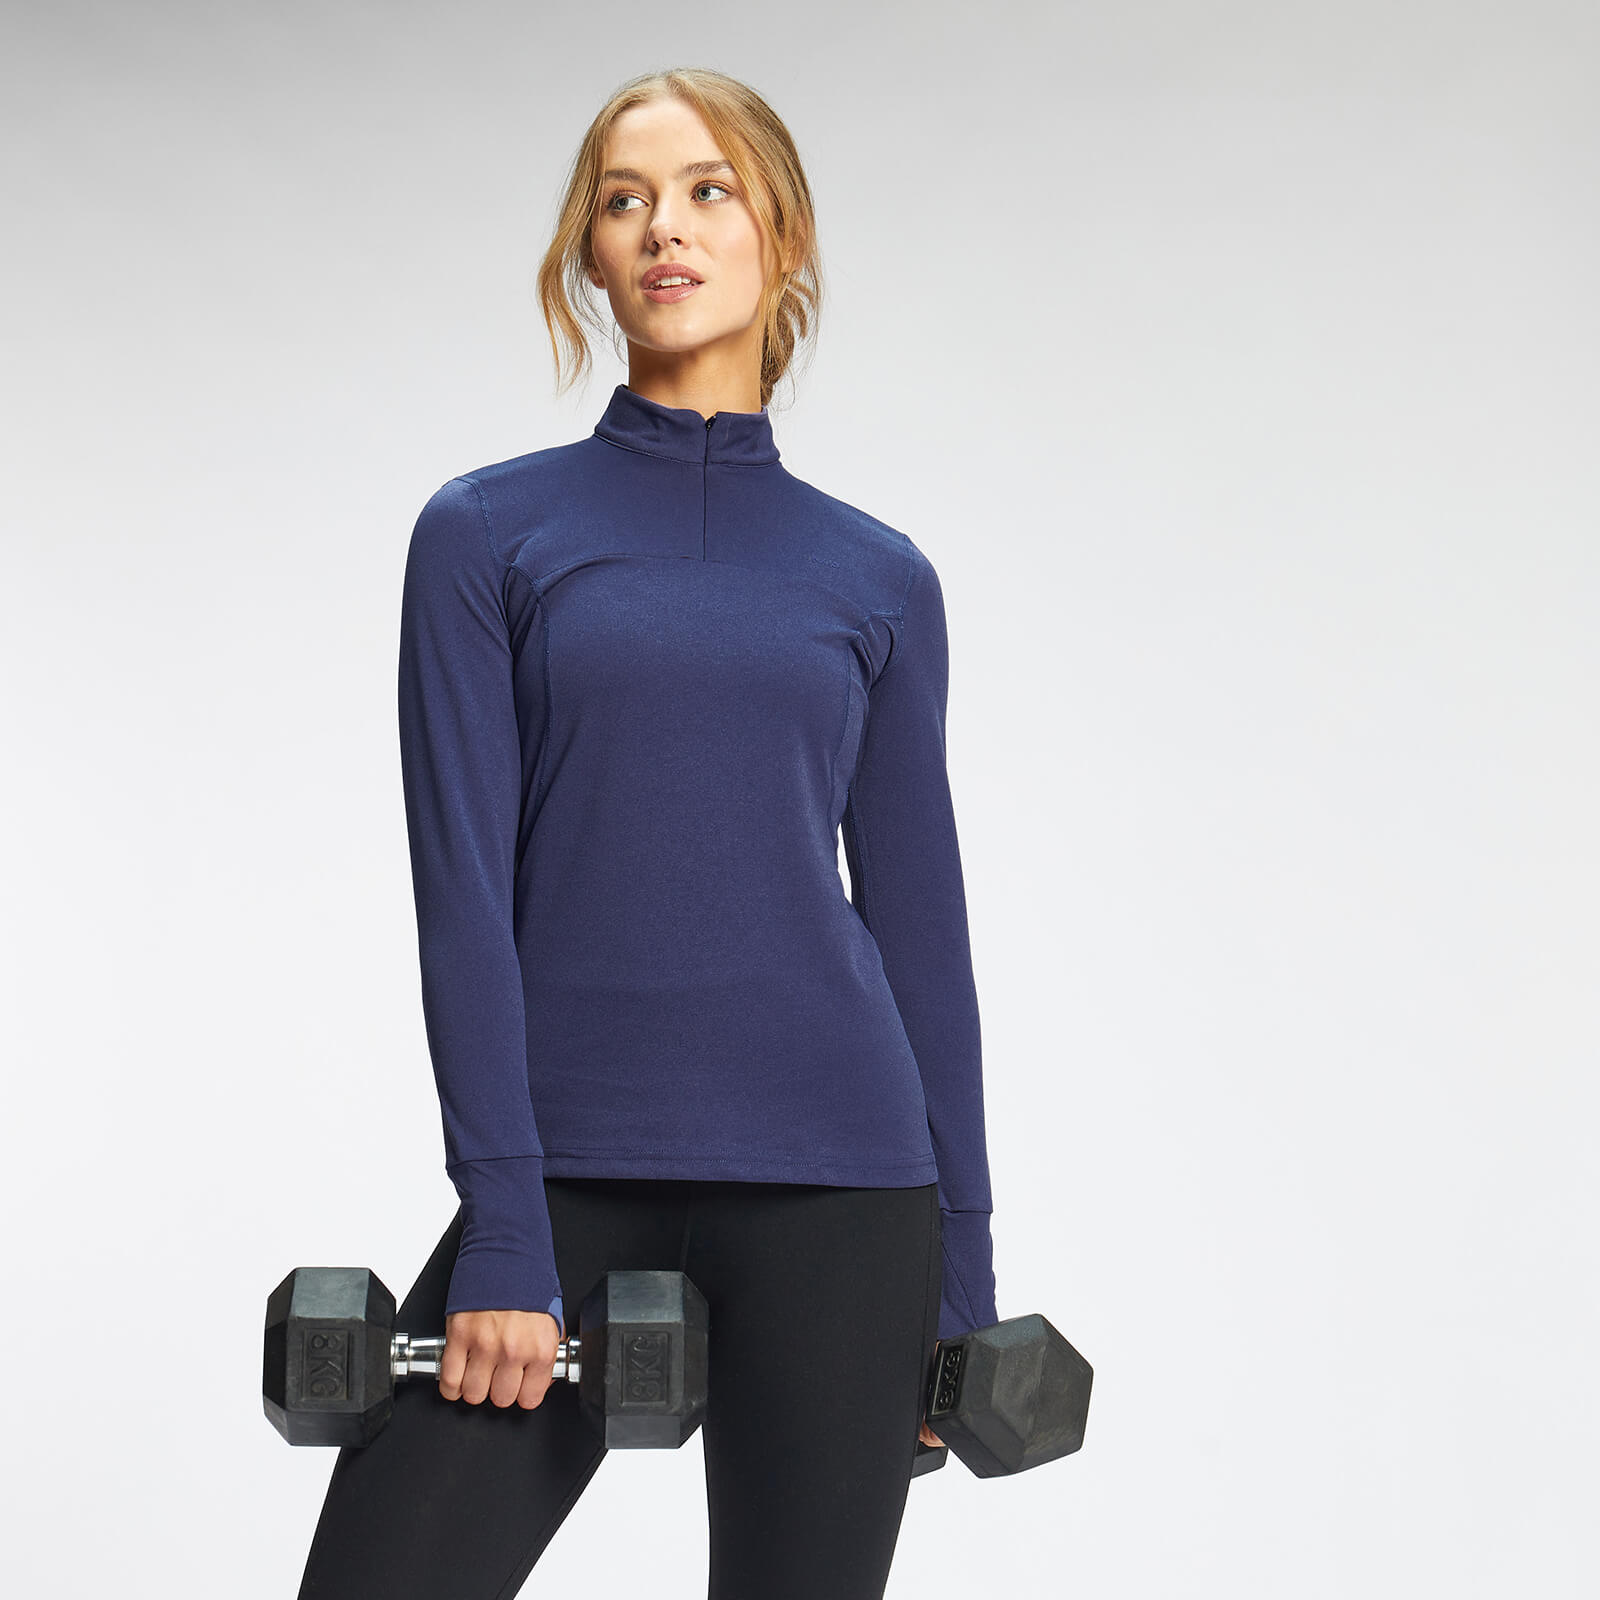 Купить MP Women's Power Ultra Regular Fit 1/4 Zip Top - Galaxy Blue - M, Myprotein International